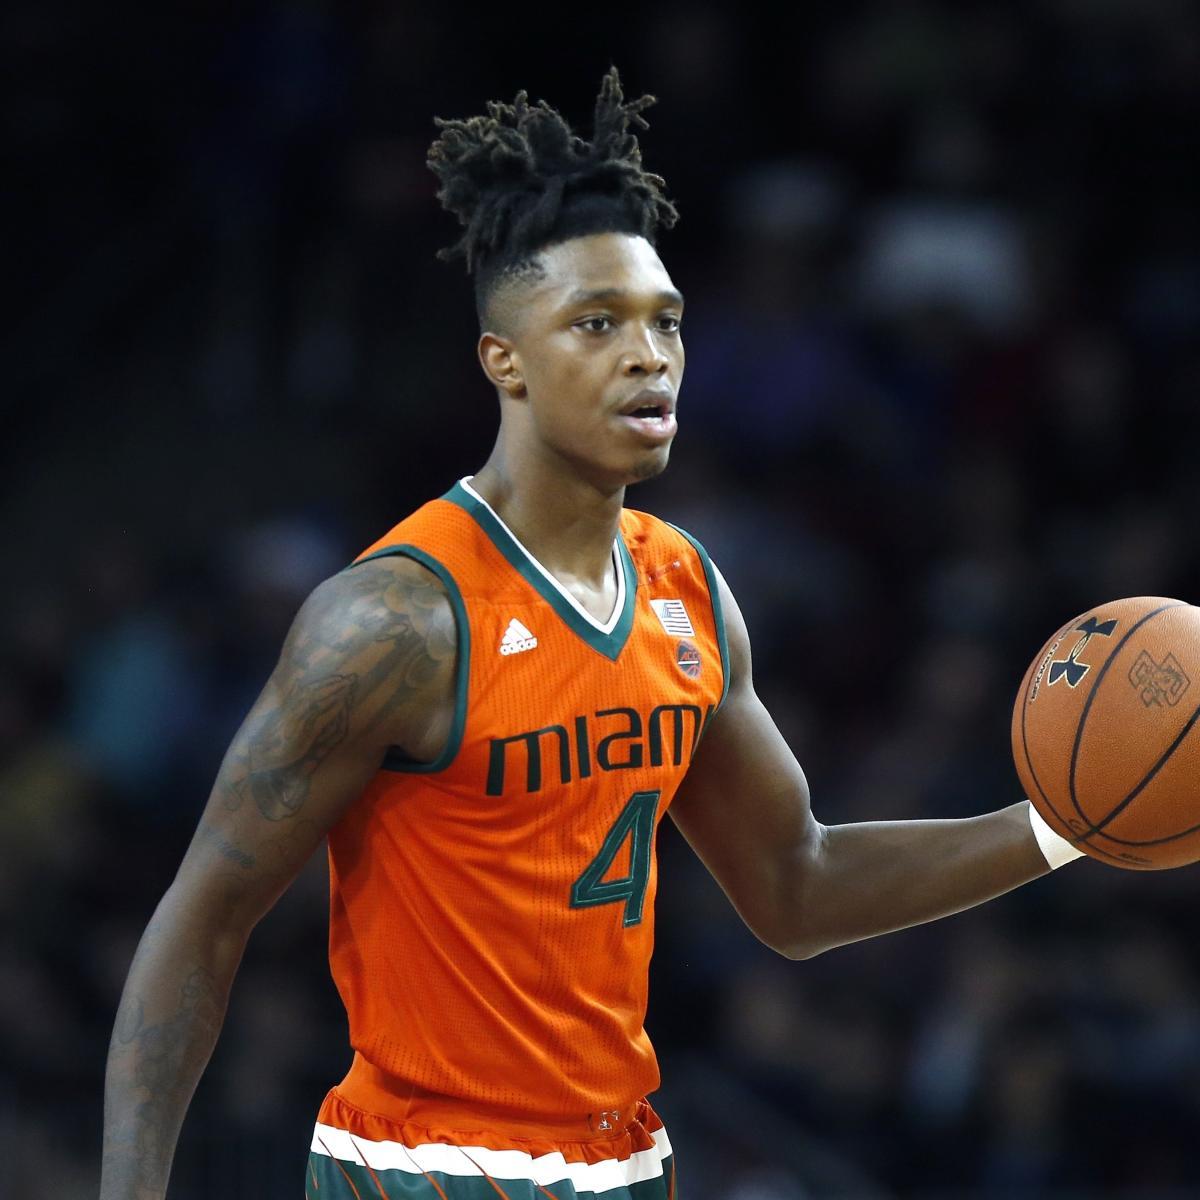 Nba Rookie Award Predictions For 2018 19 Season: 2018 NBA Mock Draft: Breakdown Of Underrated Prospects